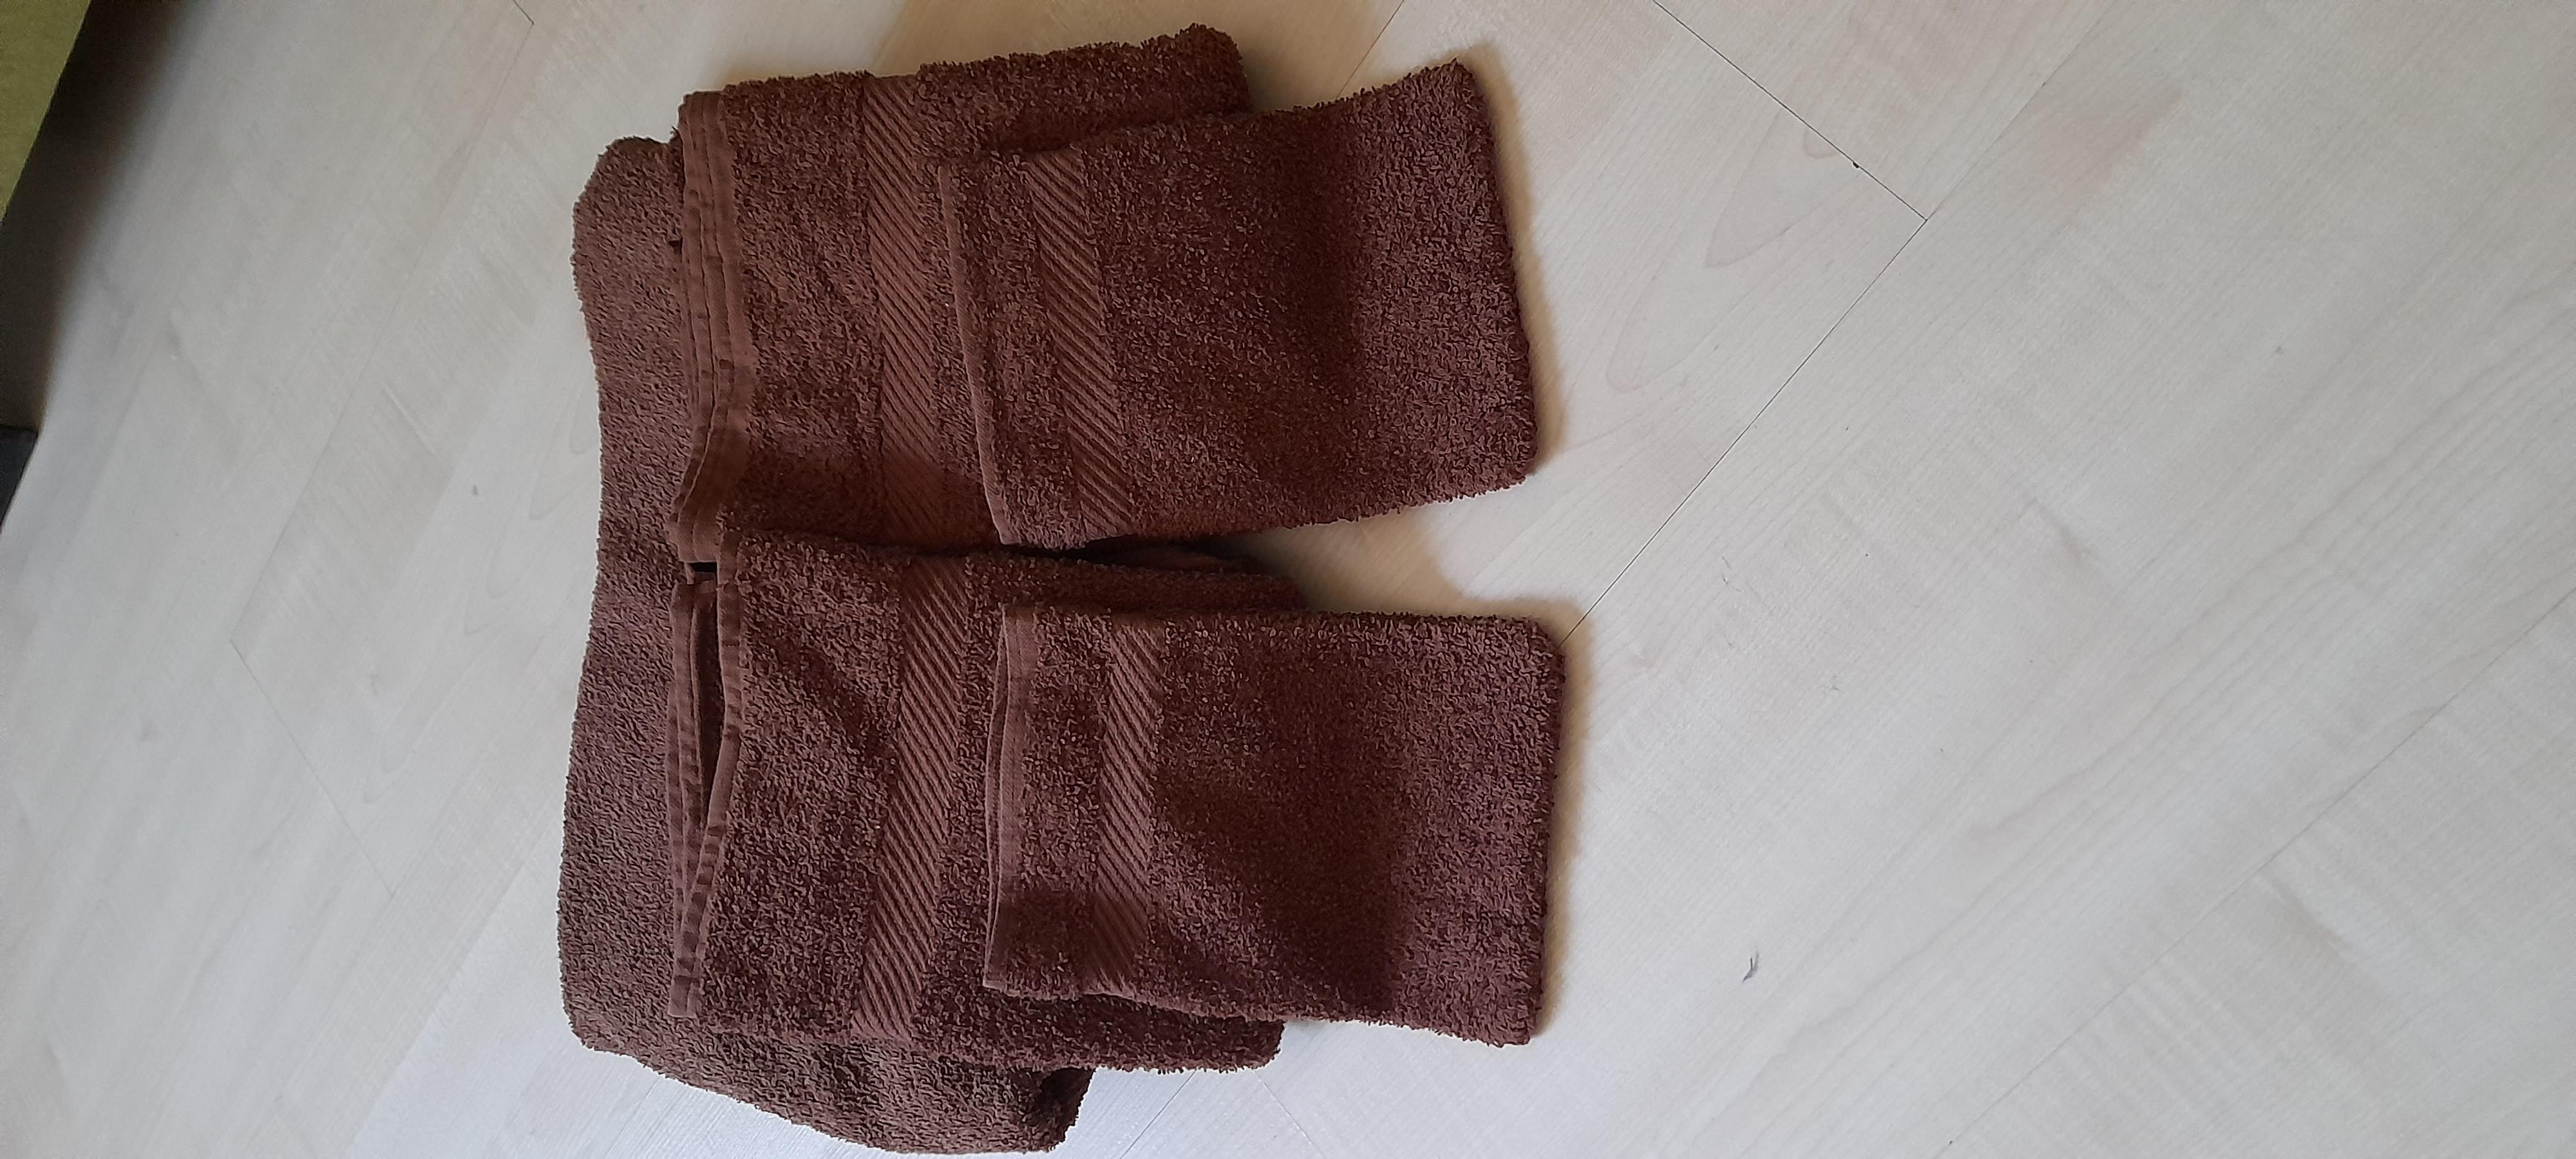 5tlg Handtücher Set tauschen